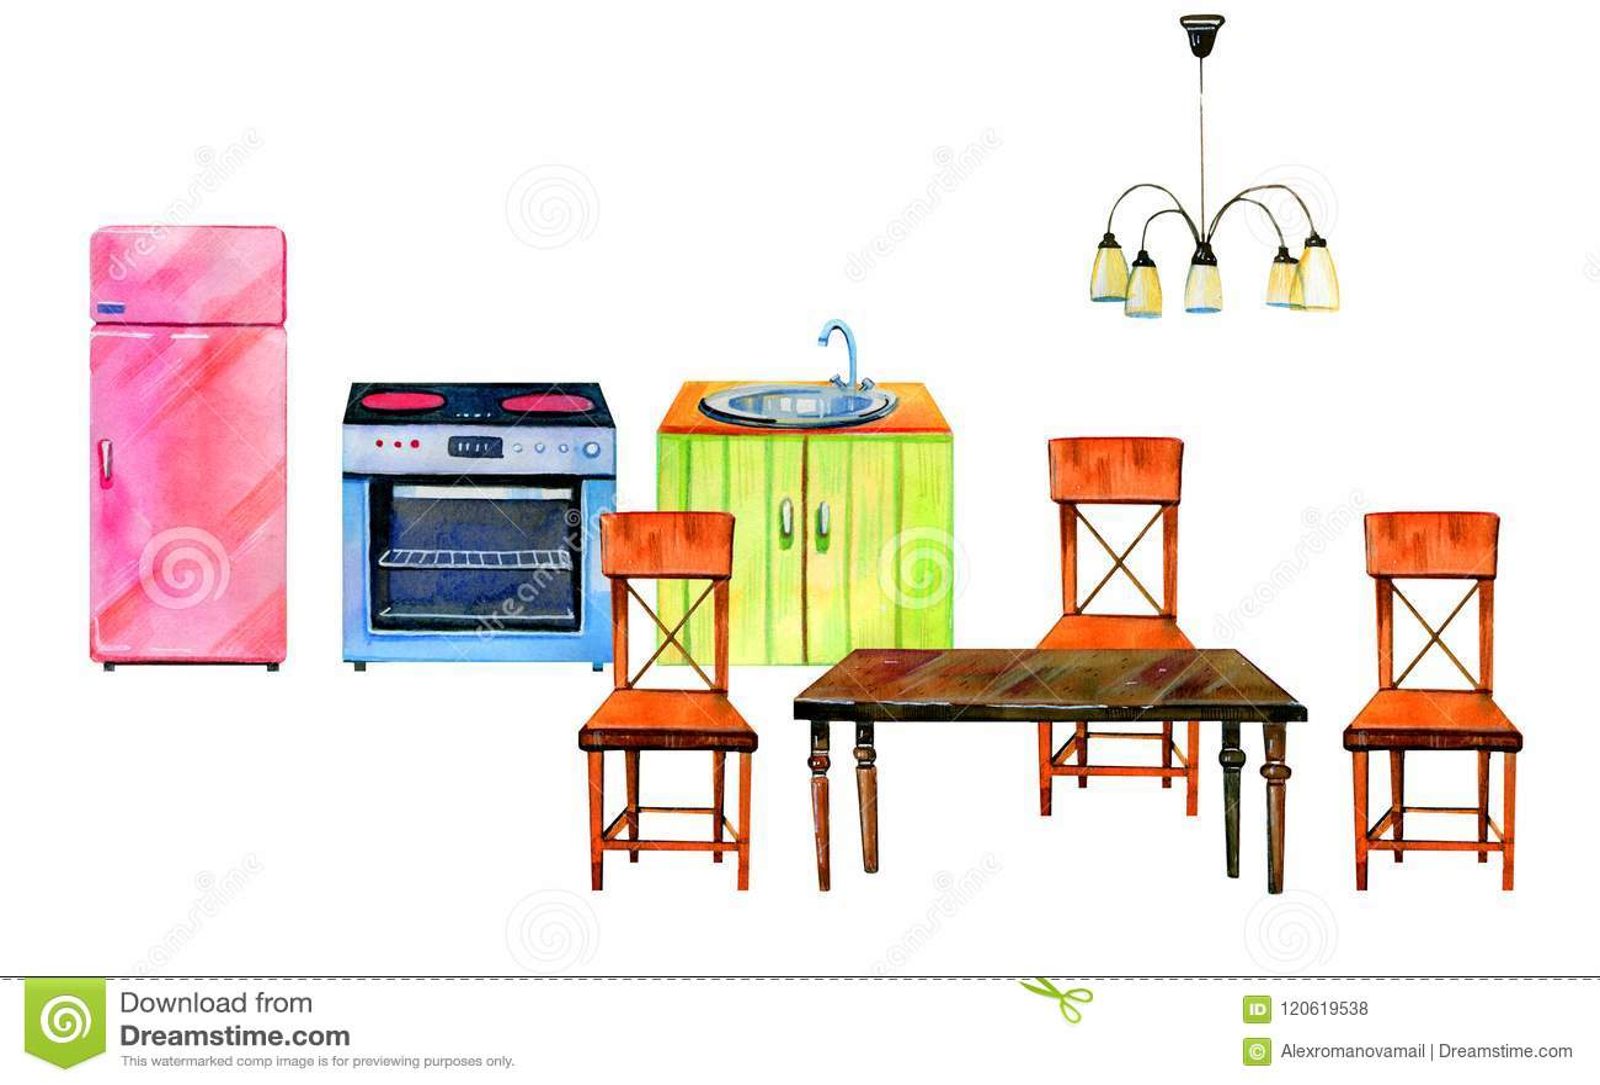 kitchen chair slipcovers minnesota cabinets 手拉的水彩套风格化厨房内部烤箱 refrigirator 桌和椅子库存例证 插画 桌和椅子